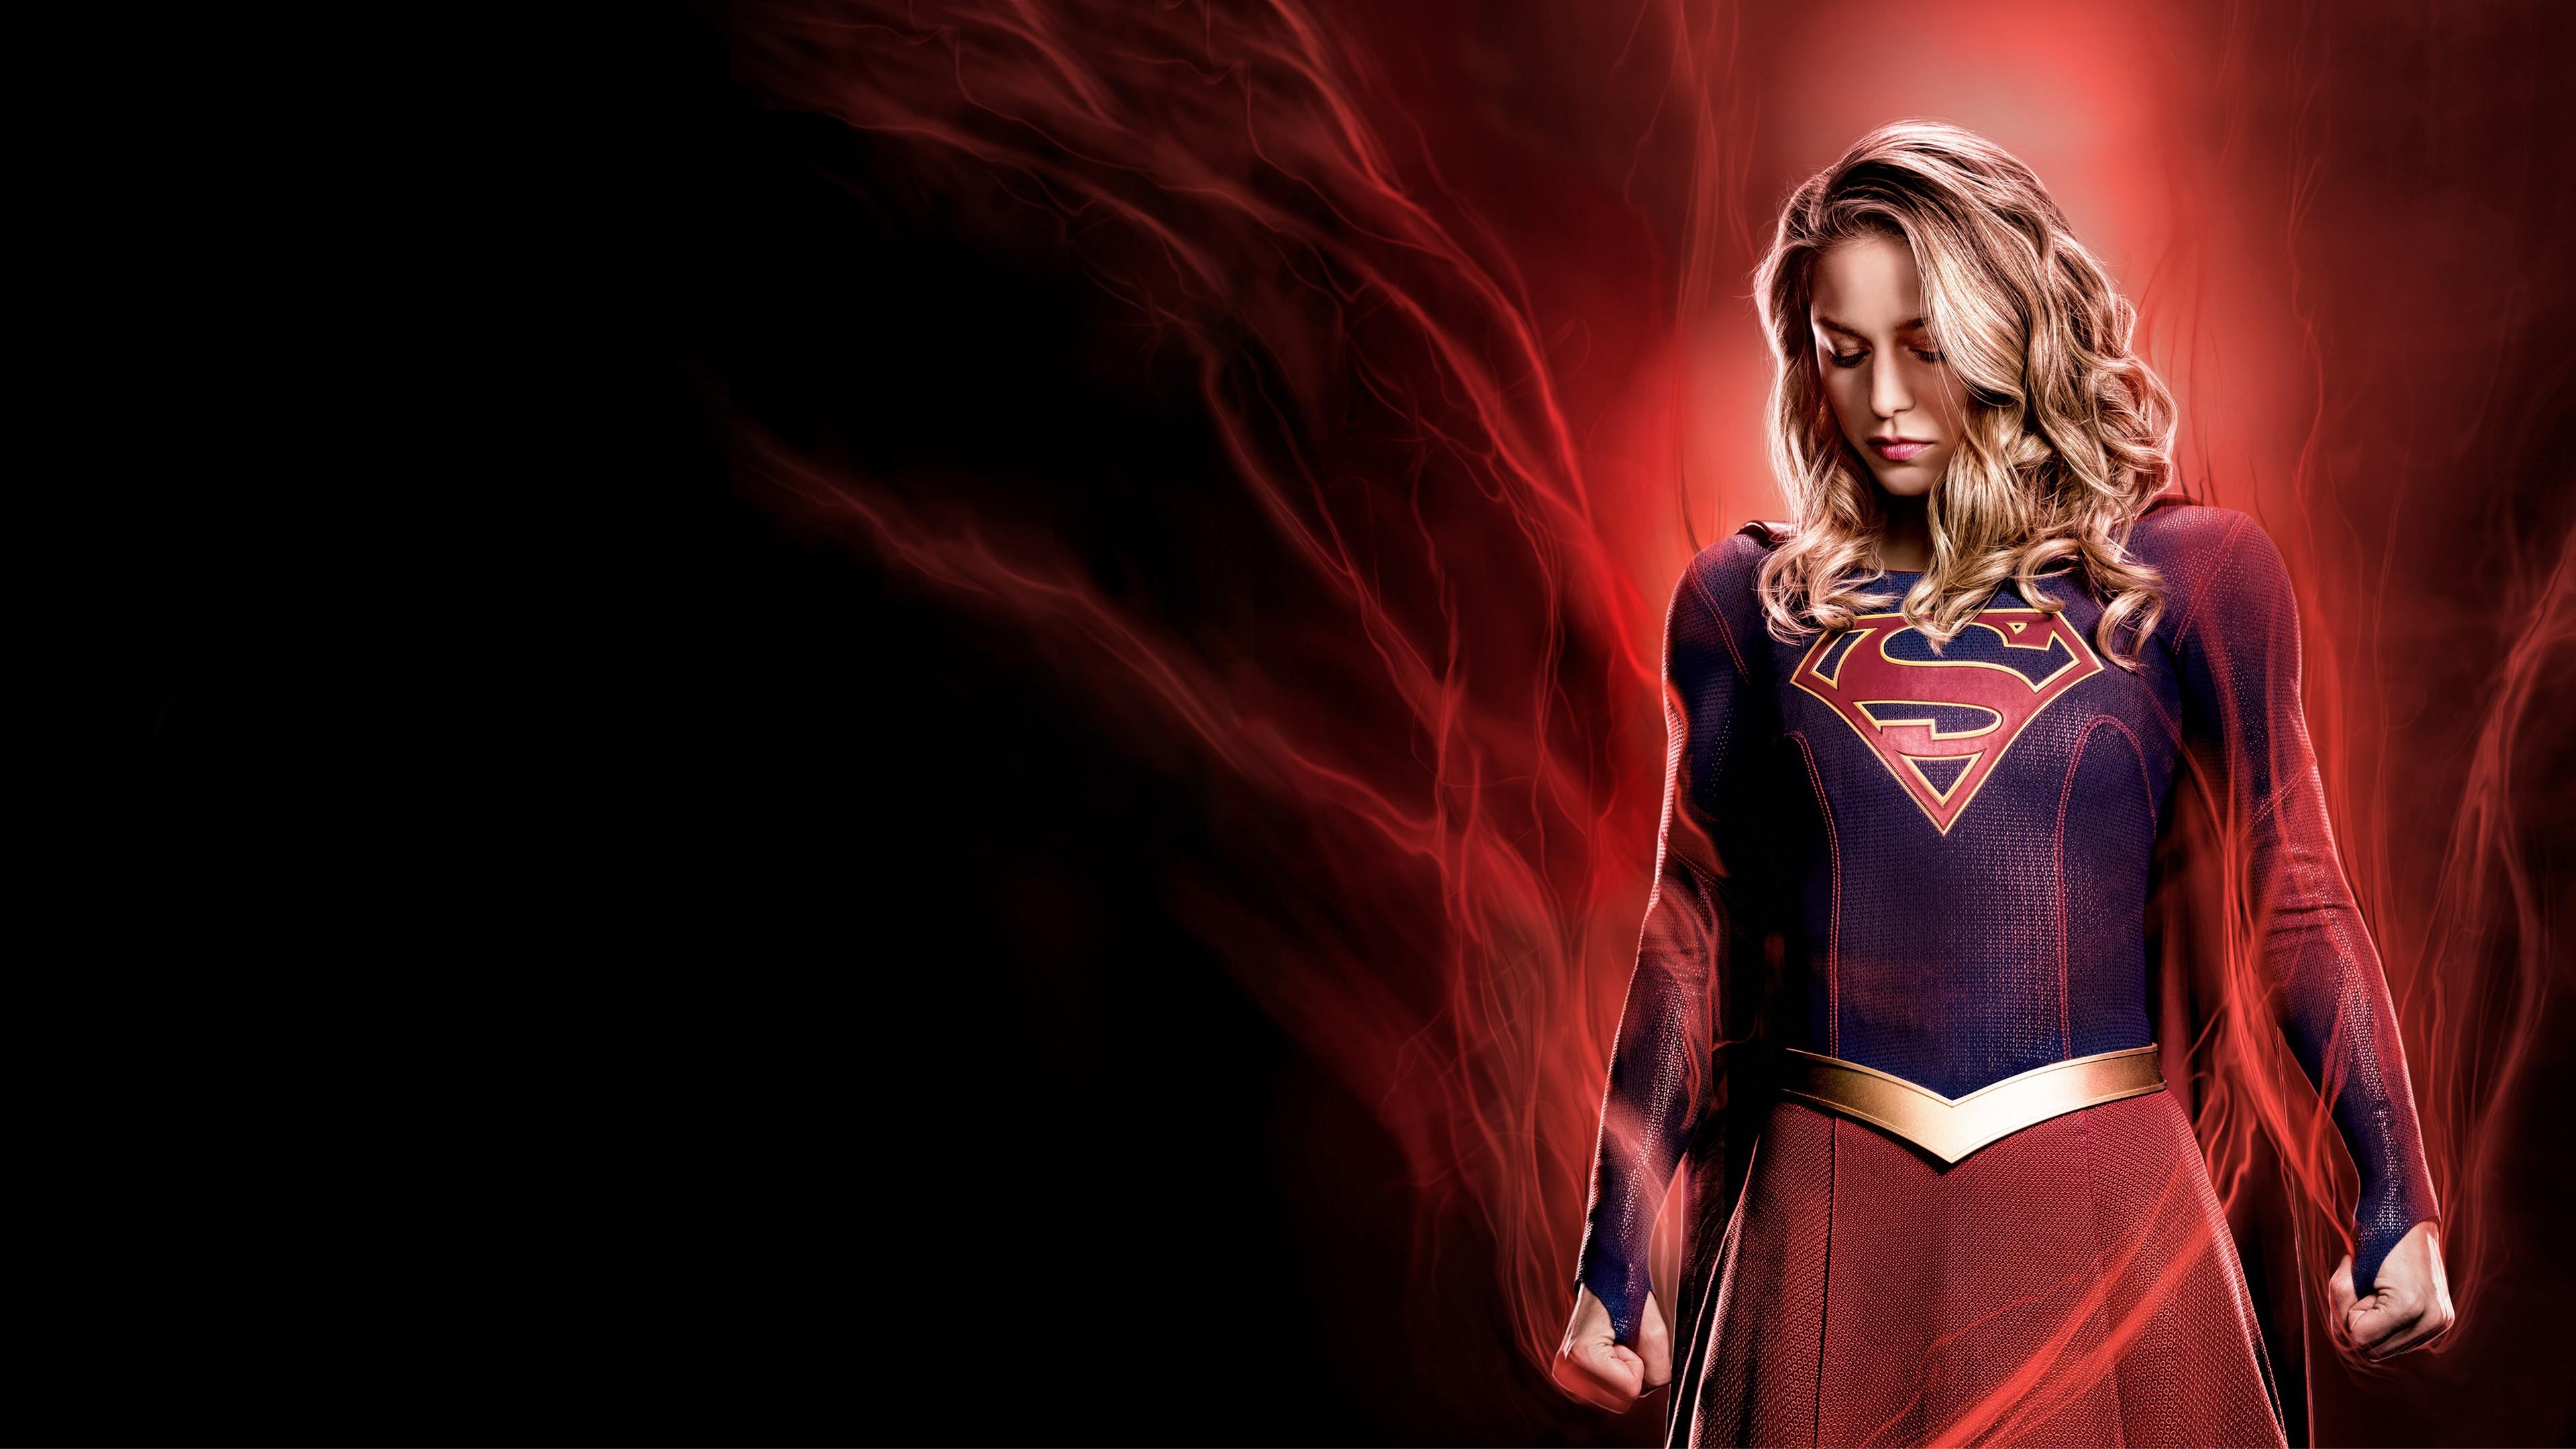 Wallpaper Supergirl Season 4